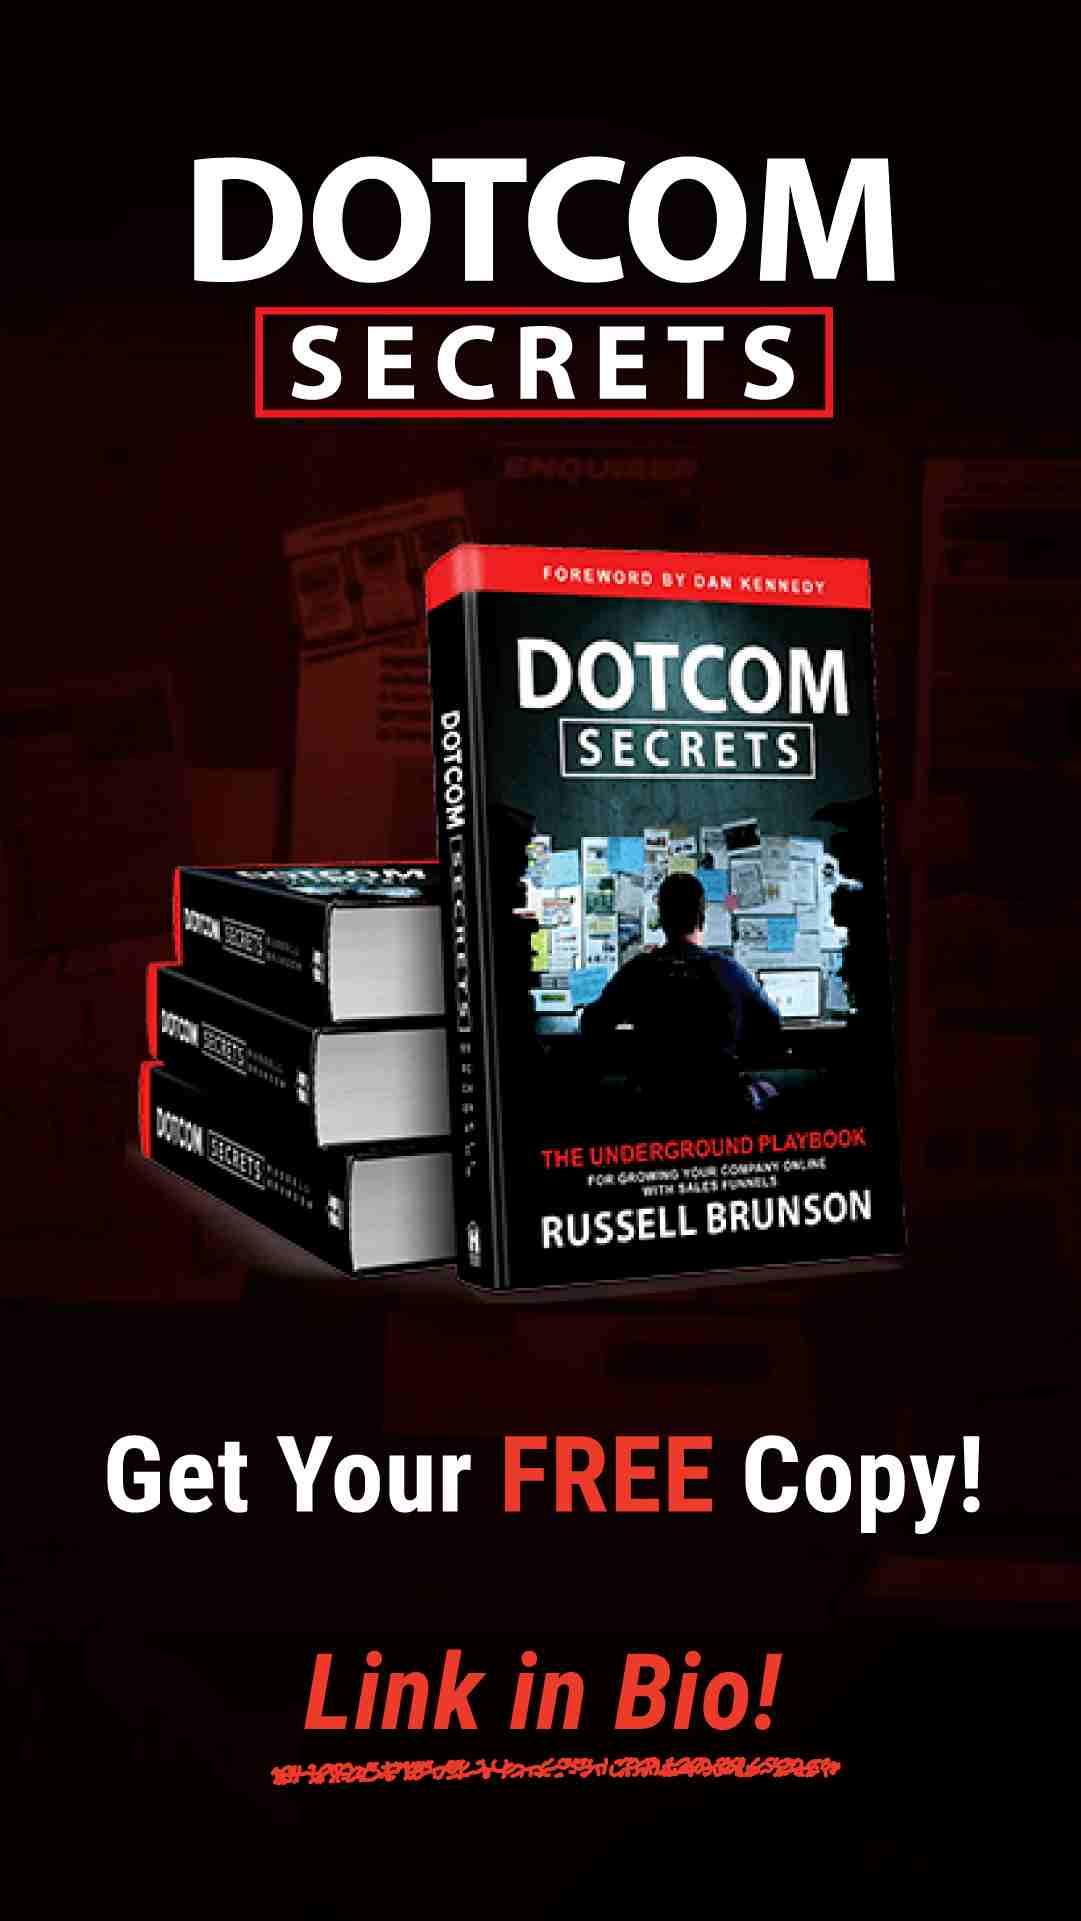 Dotcom-Secrets-ClickFunnels